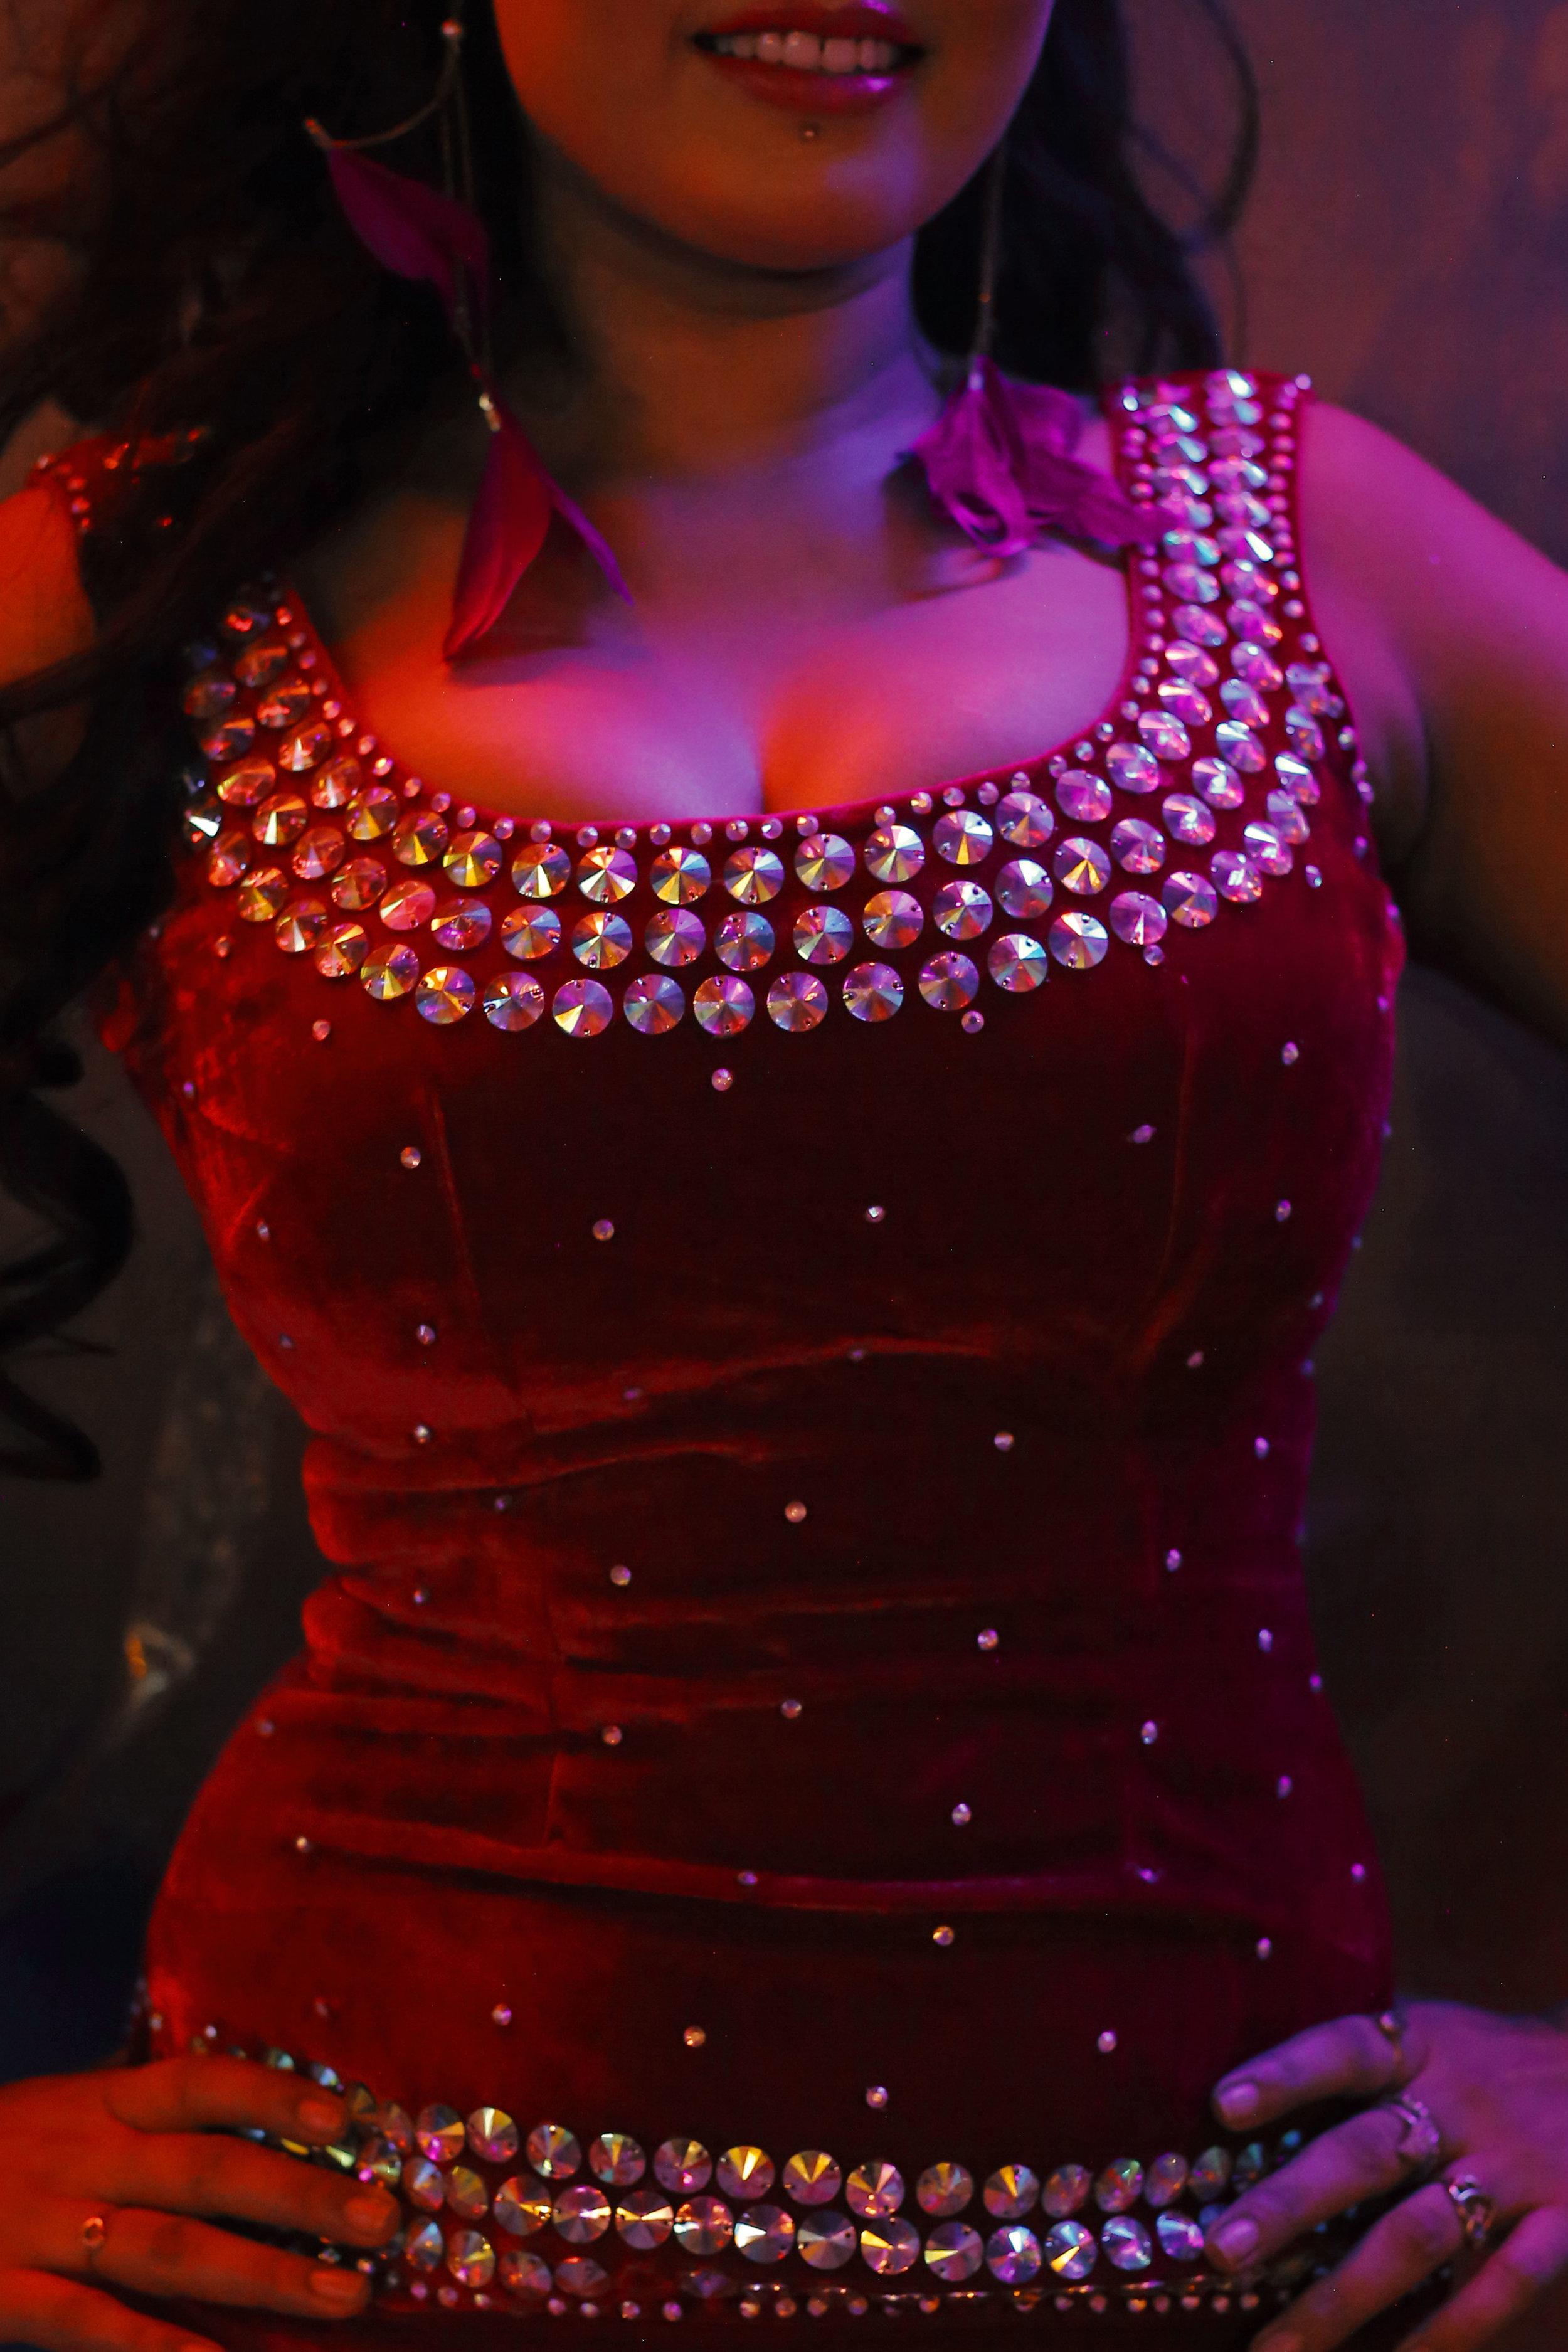 RiceMedia_BollywoodDhoom_3.jpg